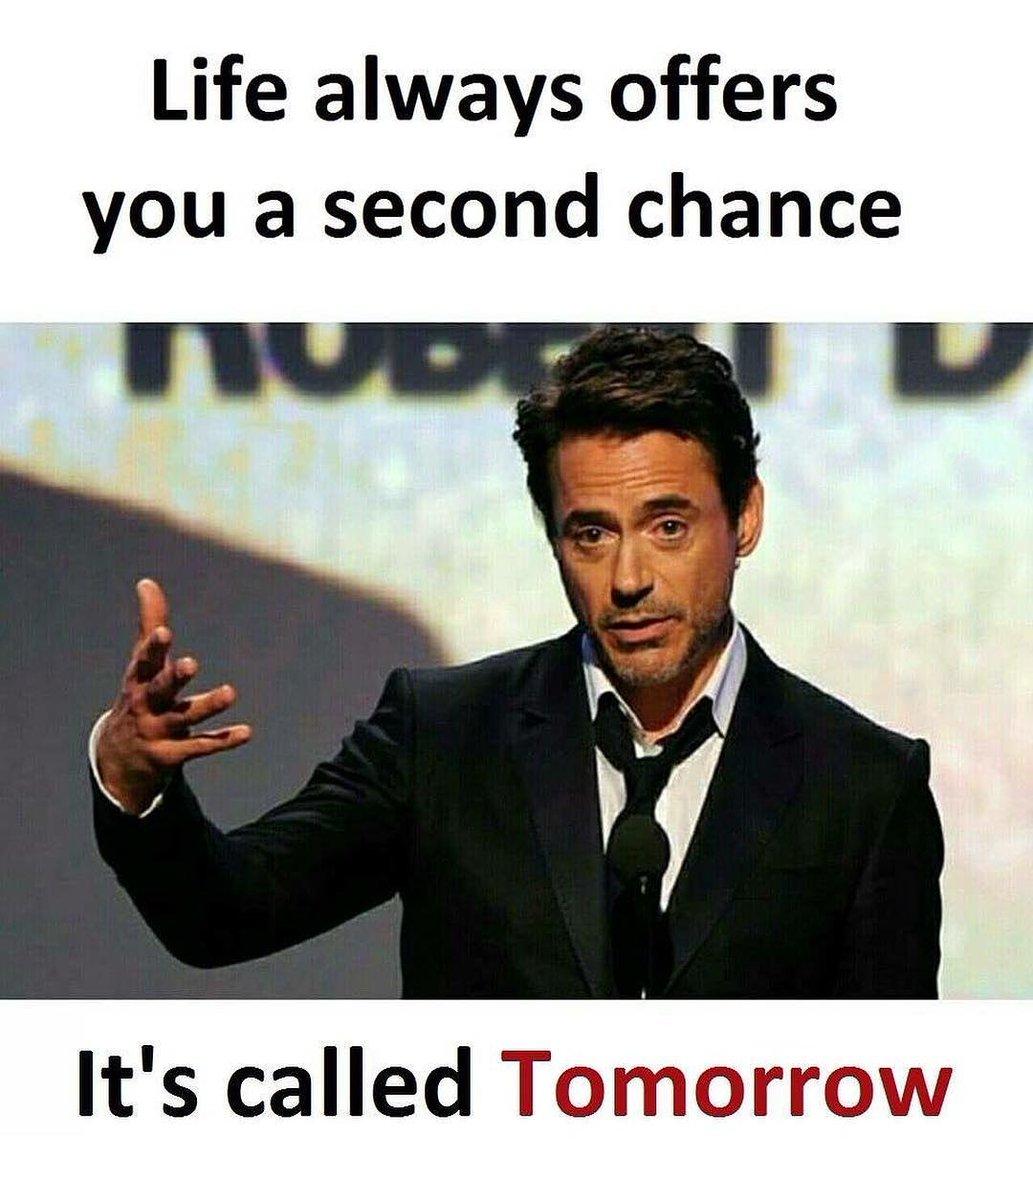 Bas ek chance  #second #chance #success #people #love #that #motivation #filterJokes #filter #jokes<br>http://pic.twitter.com/M2HmBj7aYj